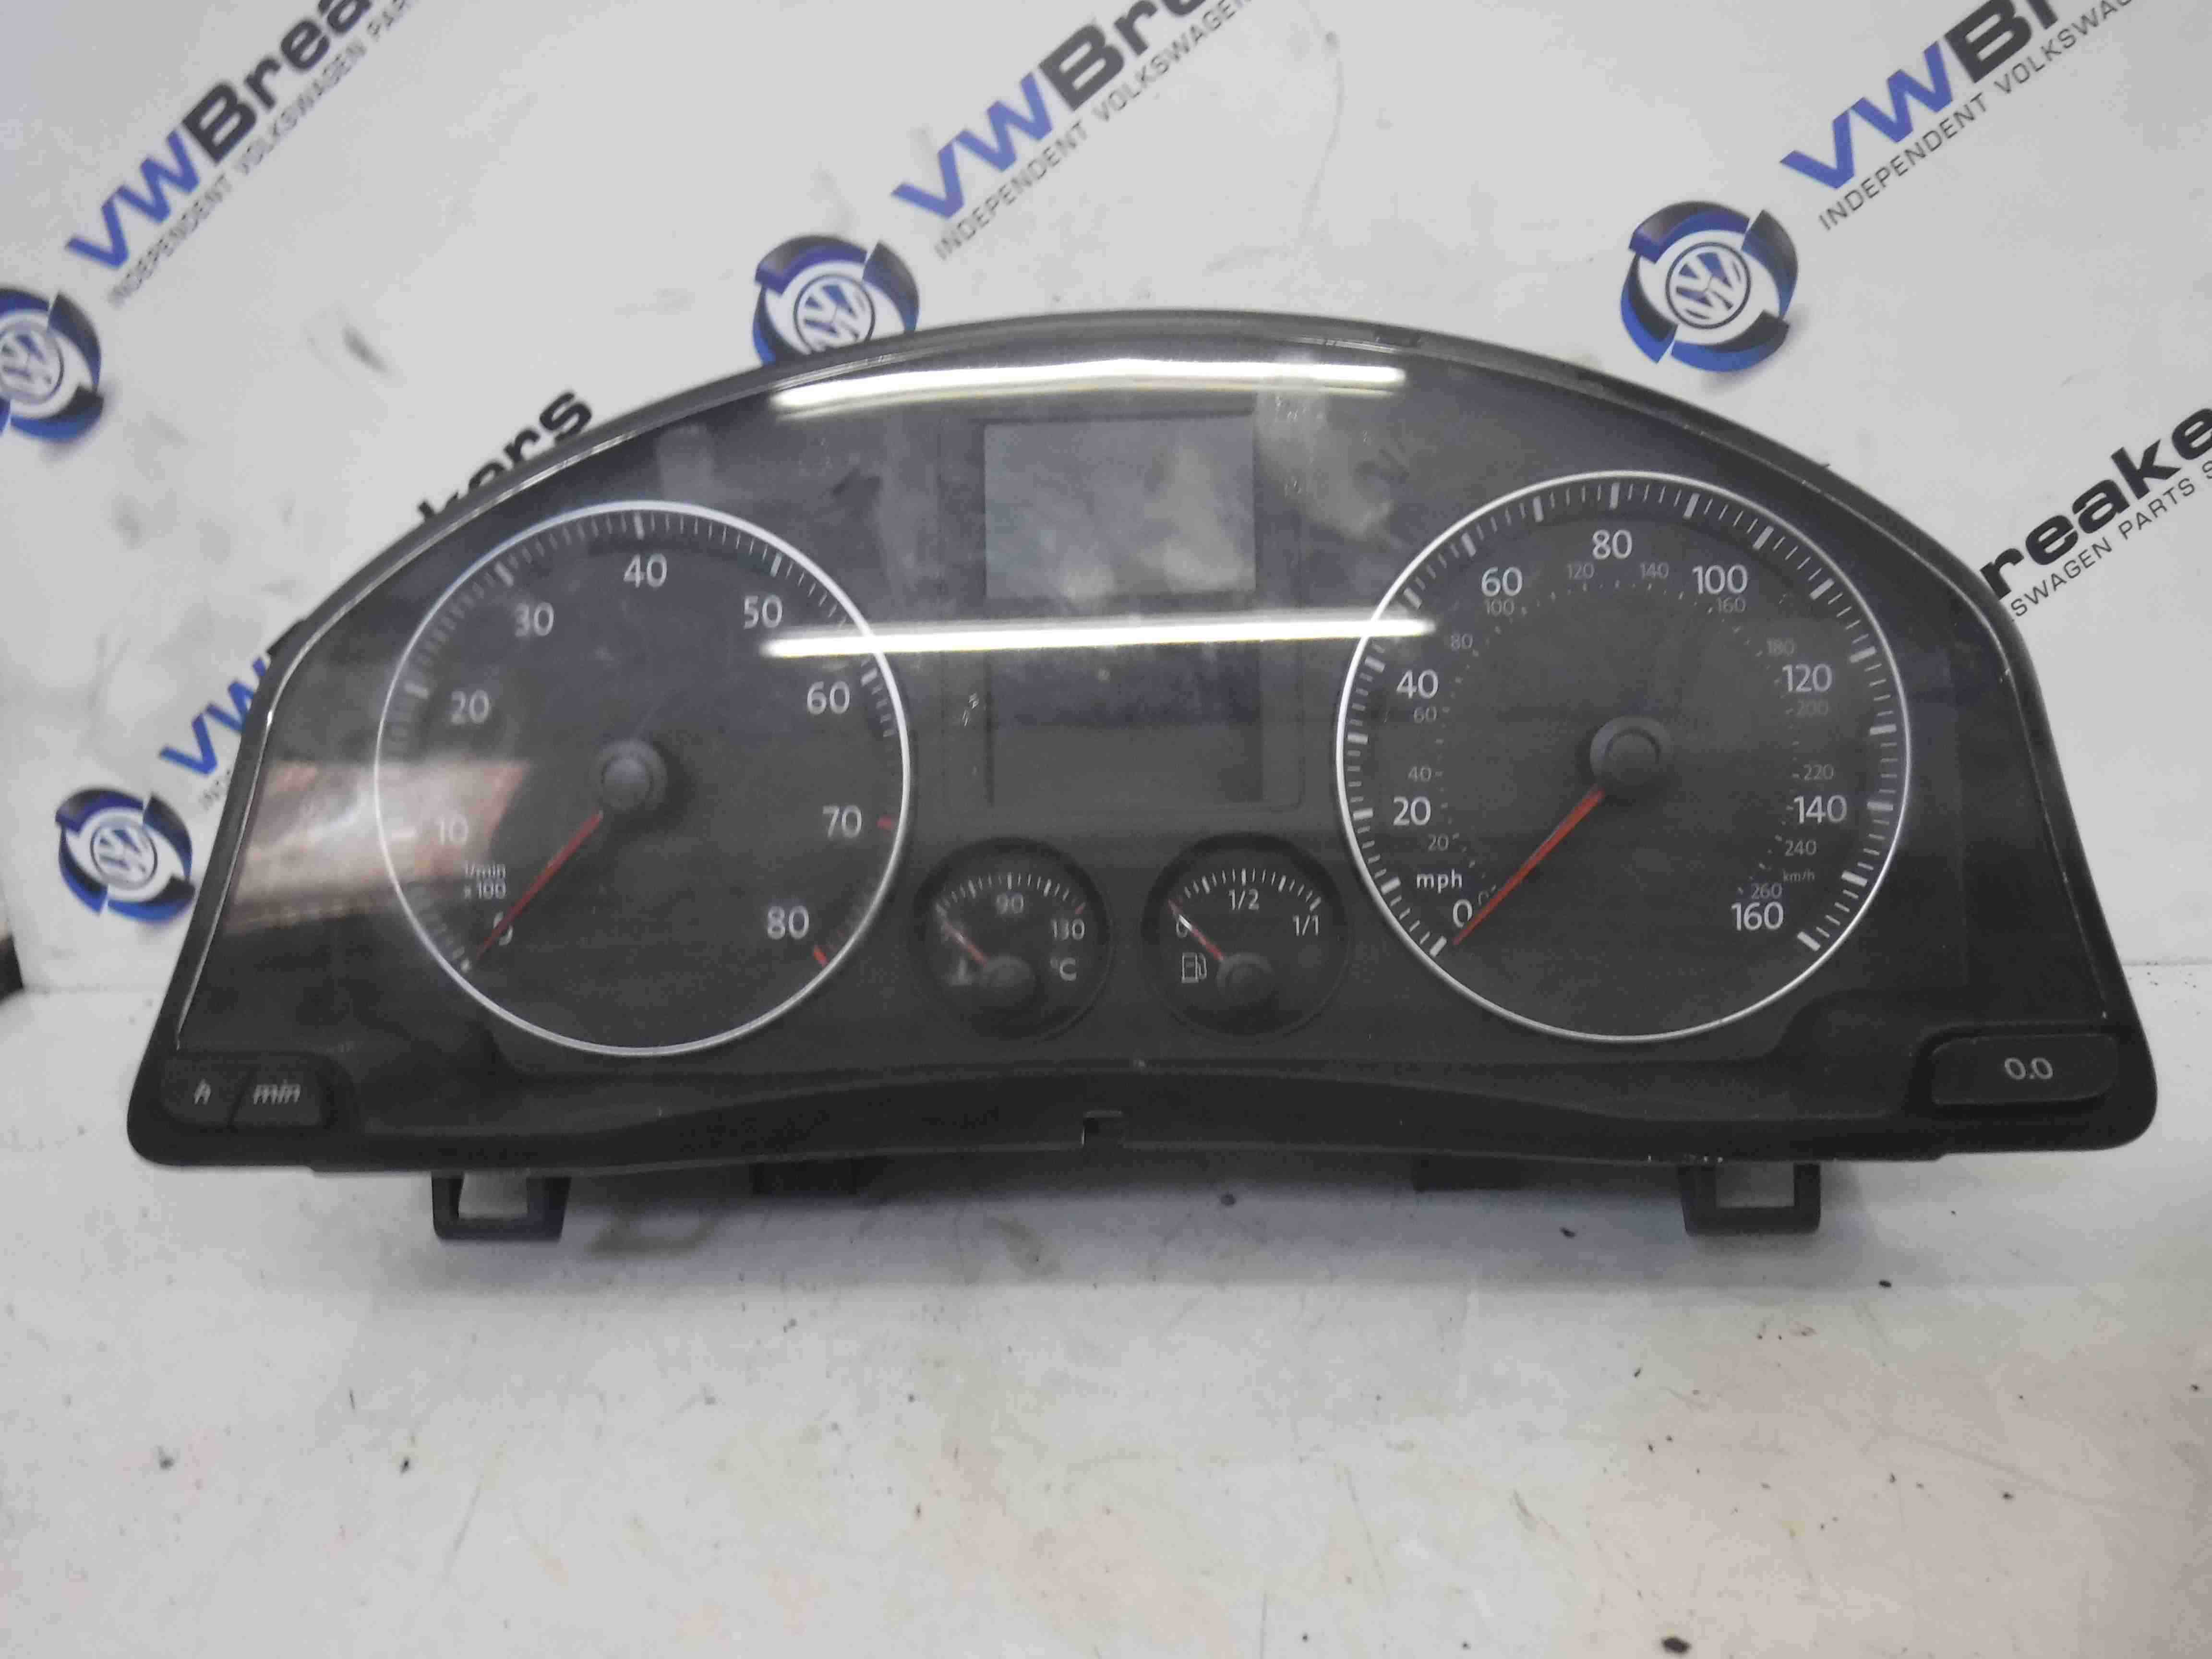 Volkswagen Golf MK5 2003-2009 Instrument Panel Dials Cluster 1K0920961A